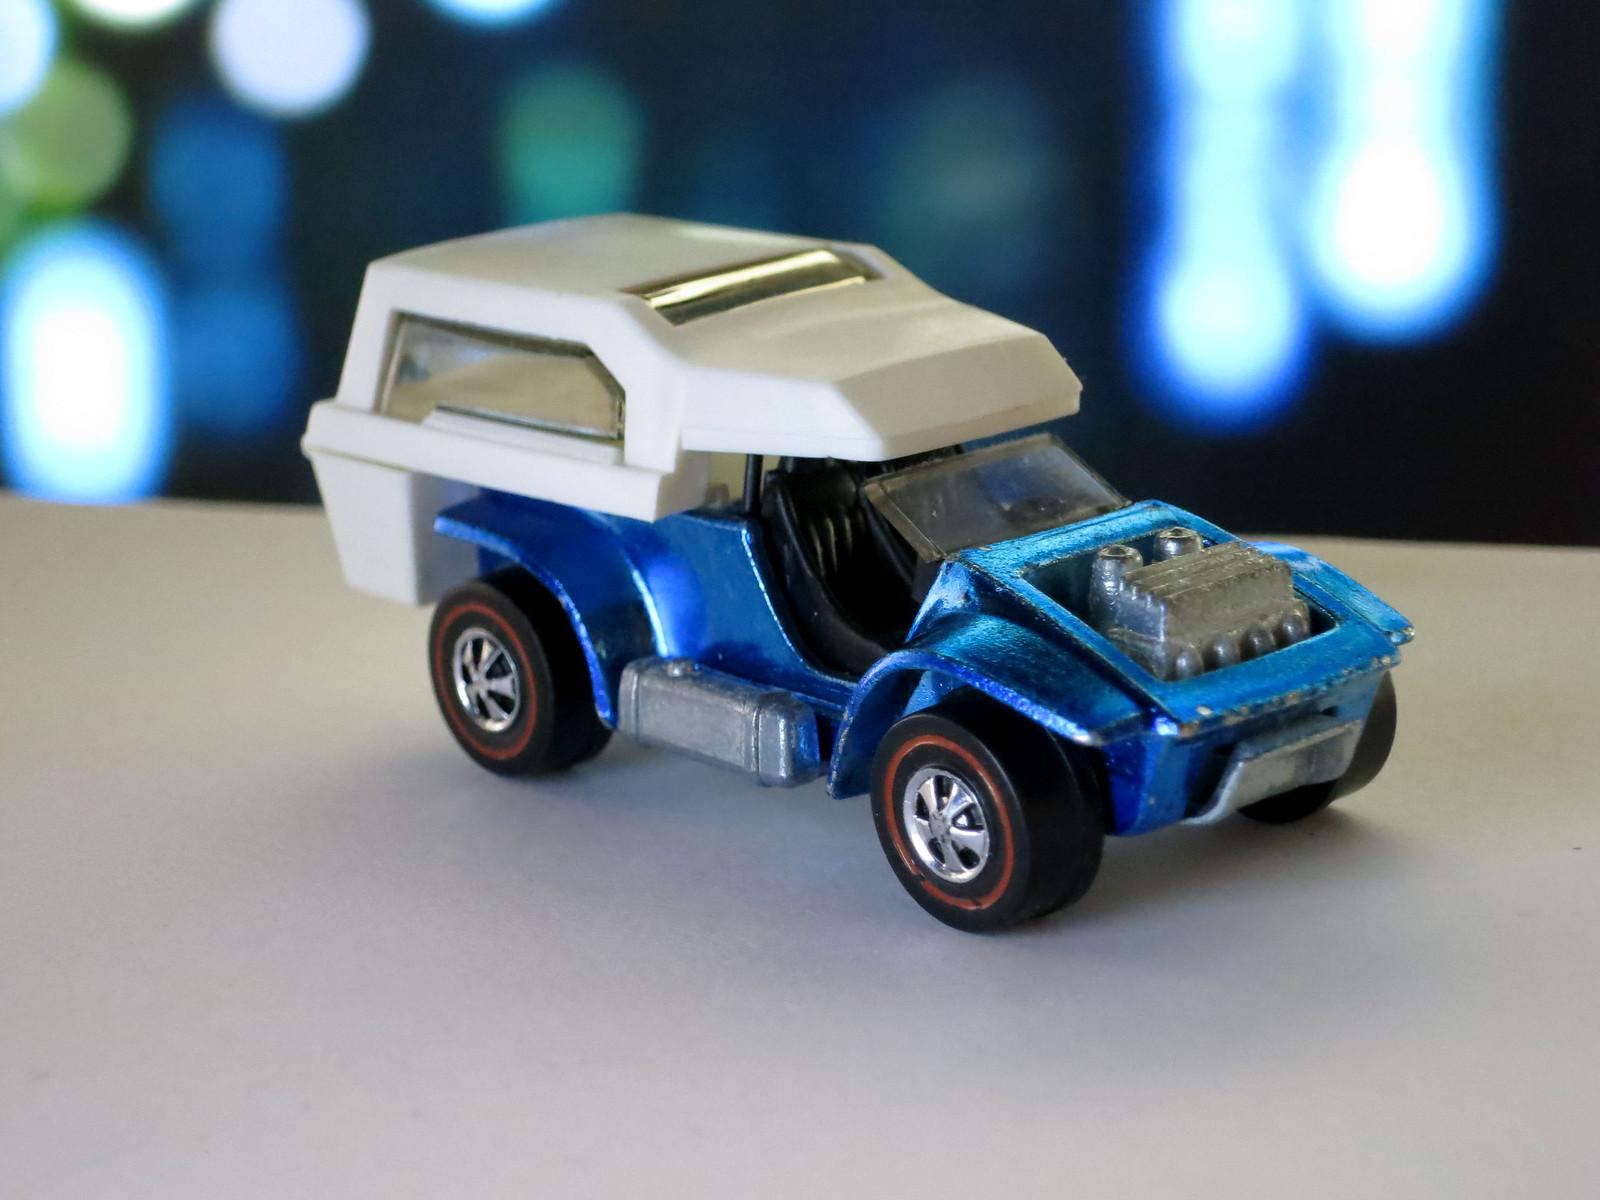 Hot Wheels Redline Blue Power Pad